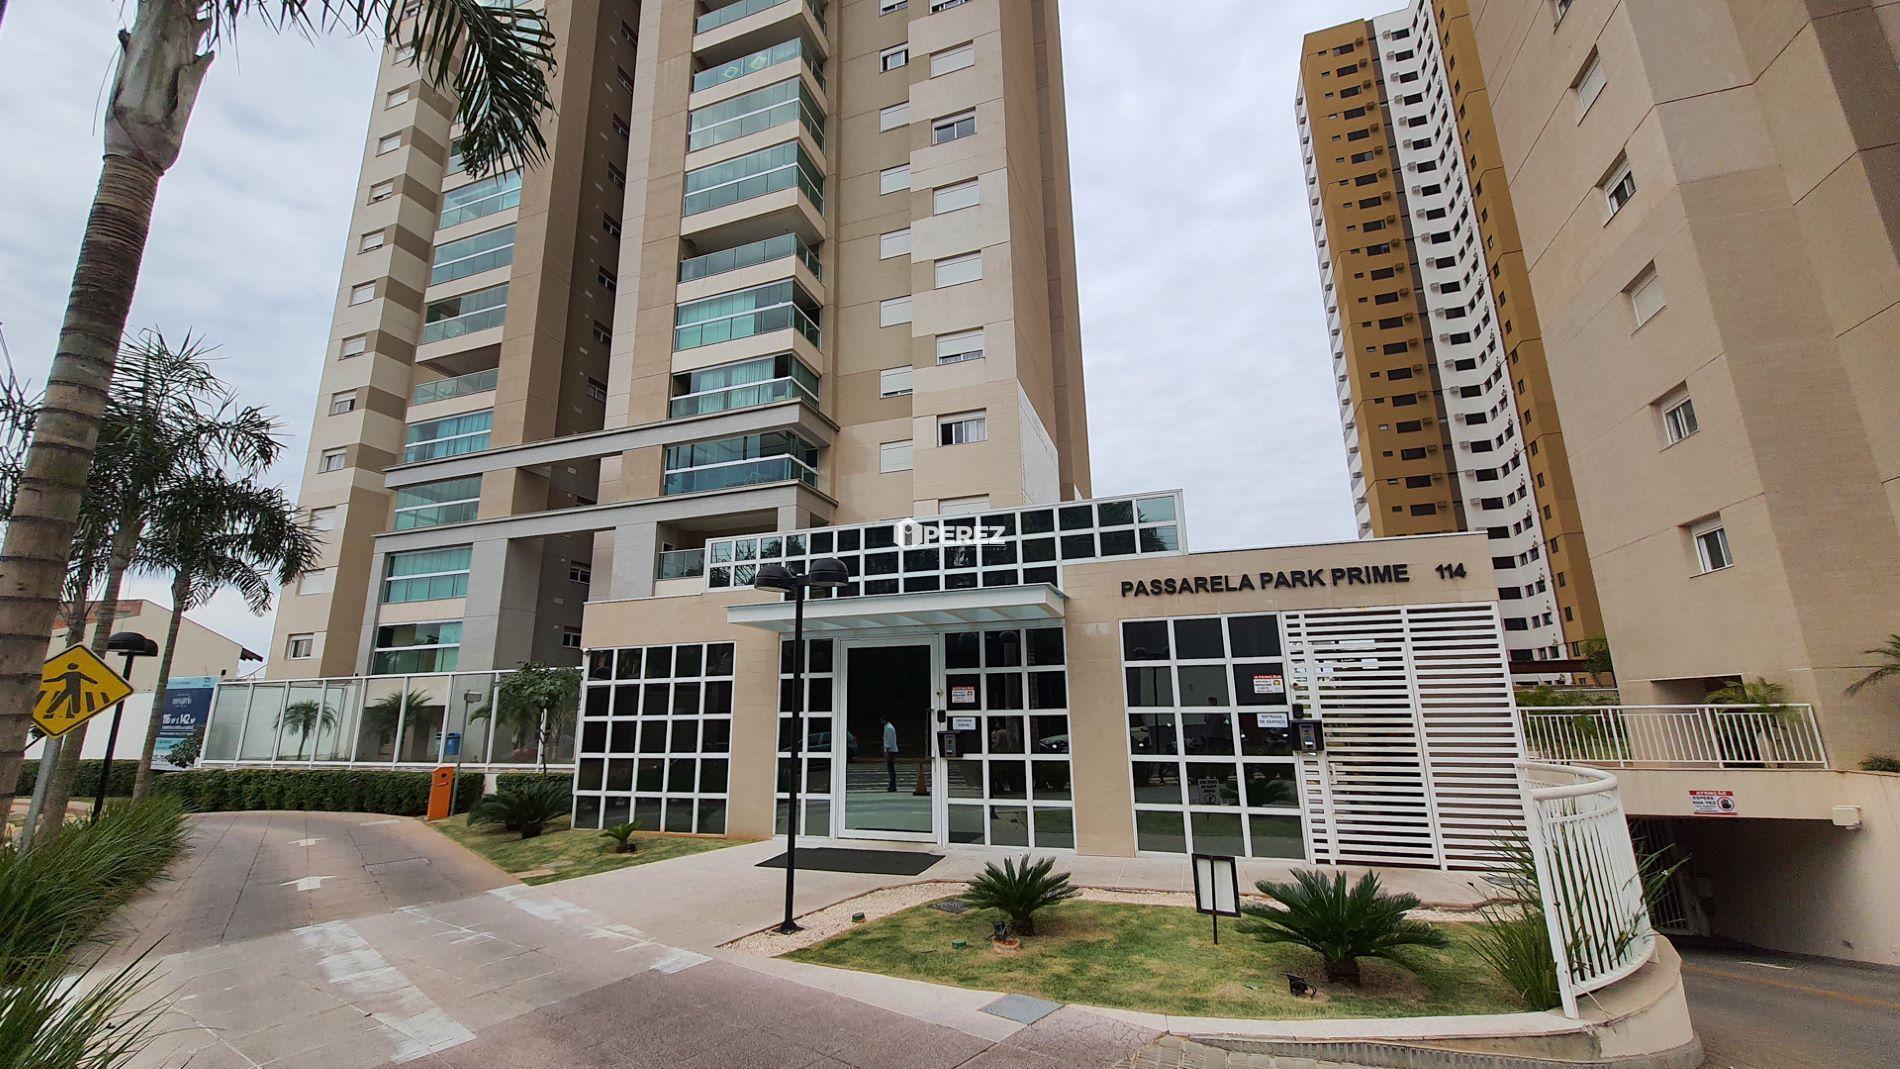 venda-campo-grande-ms-apartamento-tabeliao-murilo-rolim-vivendas-do-bosque-perez-imoveis